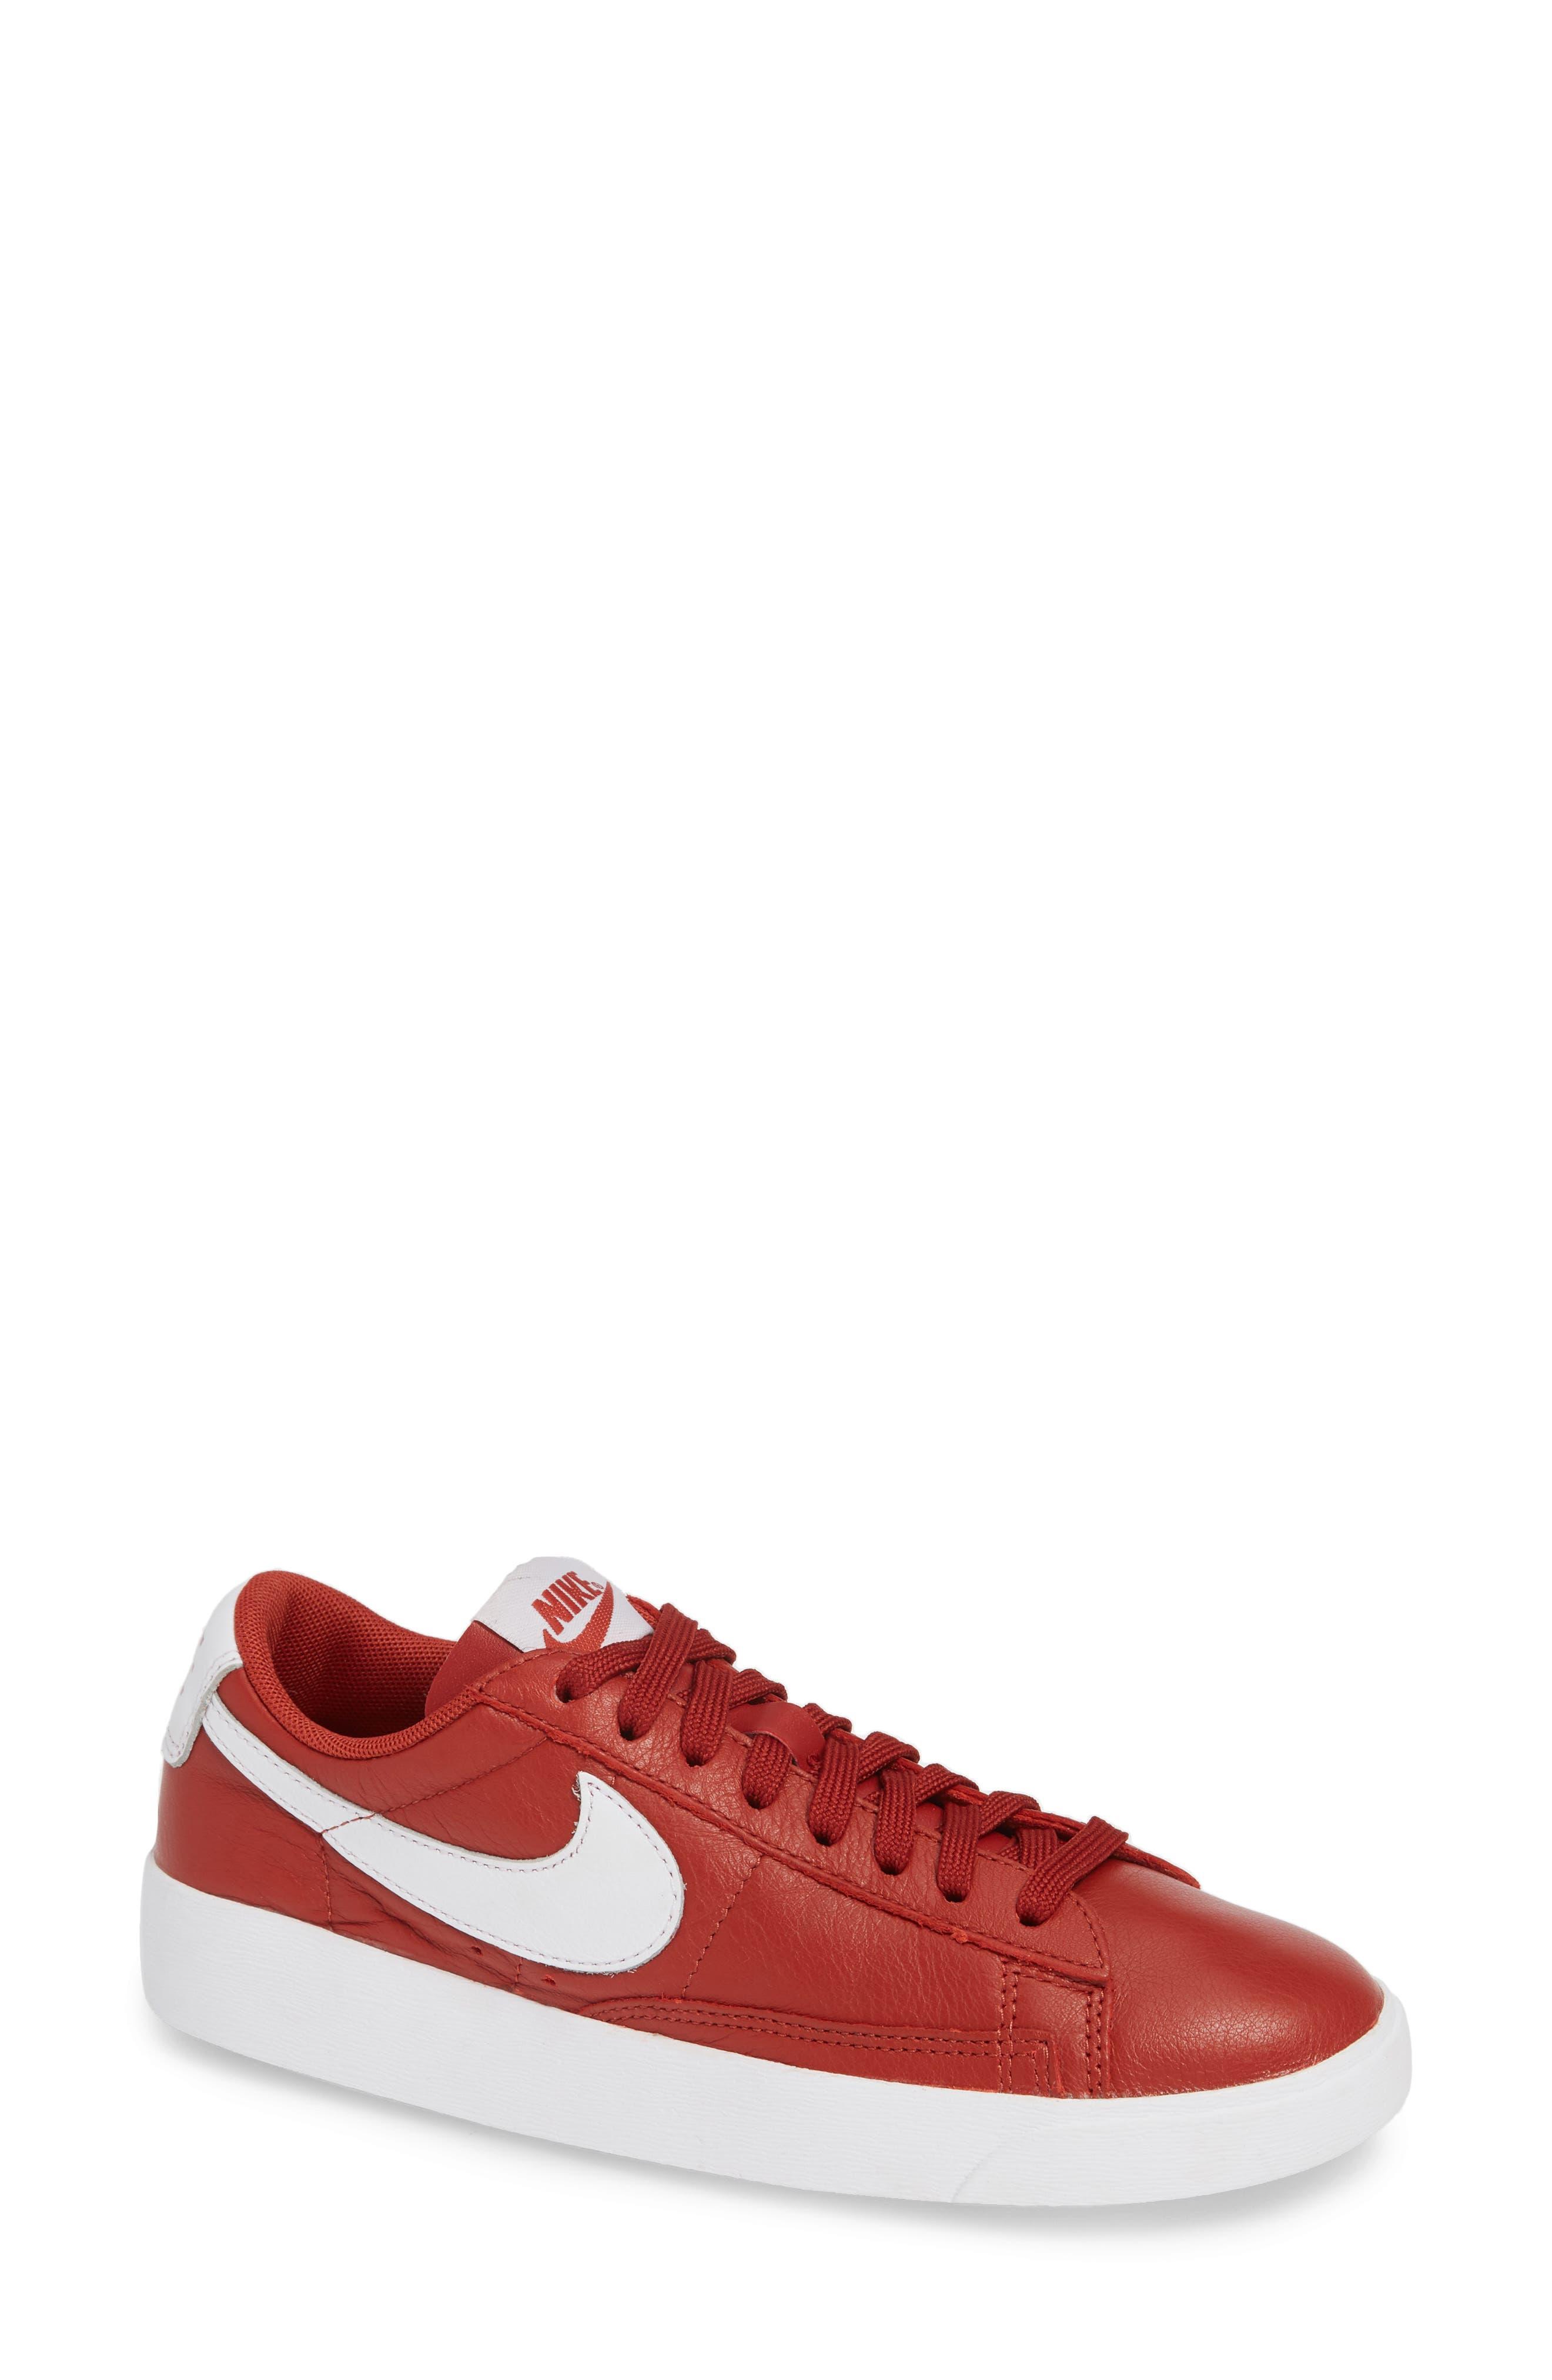 Blazer Low SE Sneaker,                             Main thumbnail 1, color,                             DUNE RED/ WHITE-DUNE RED